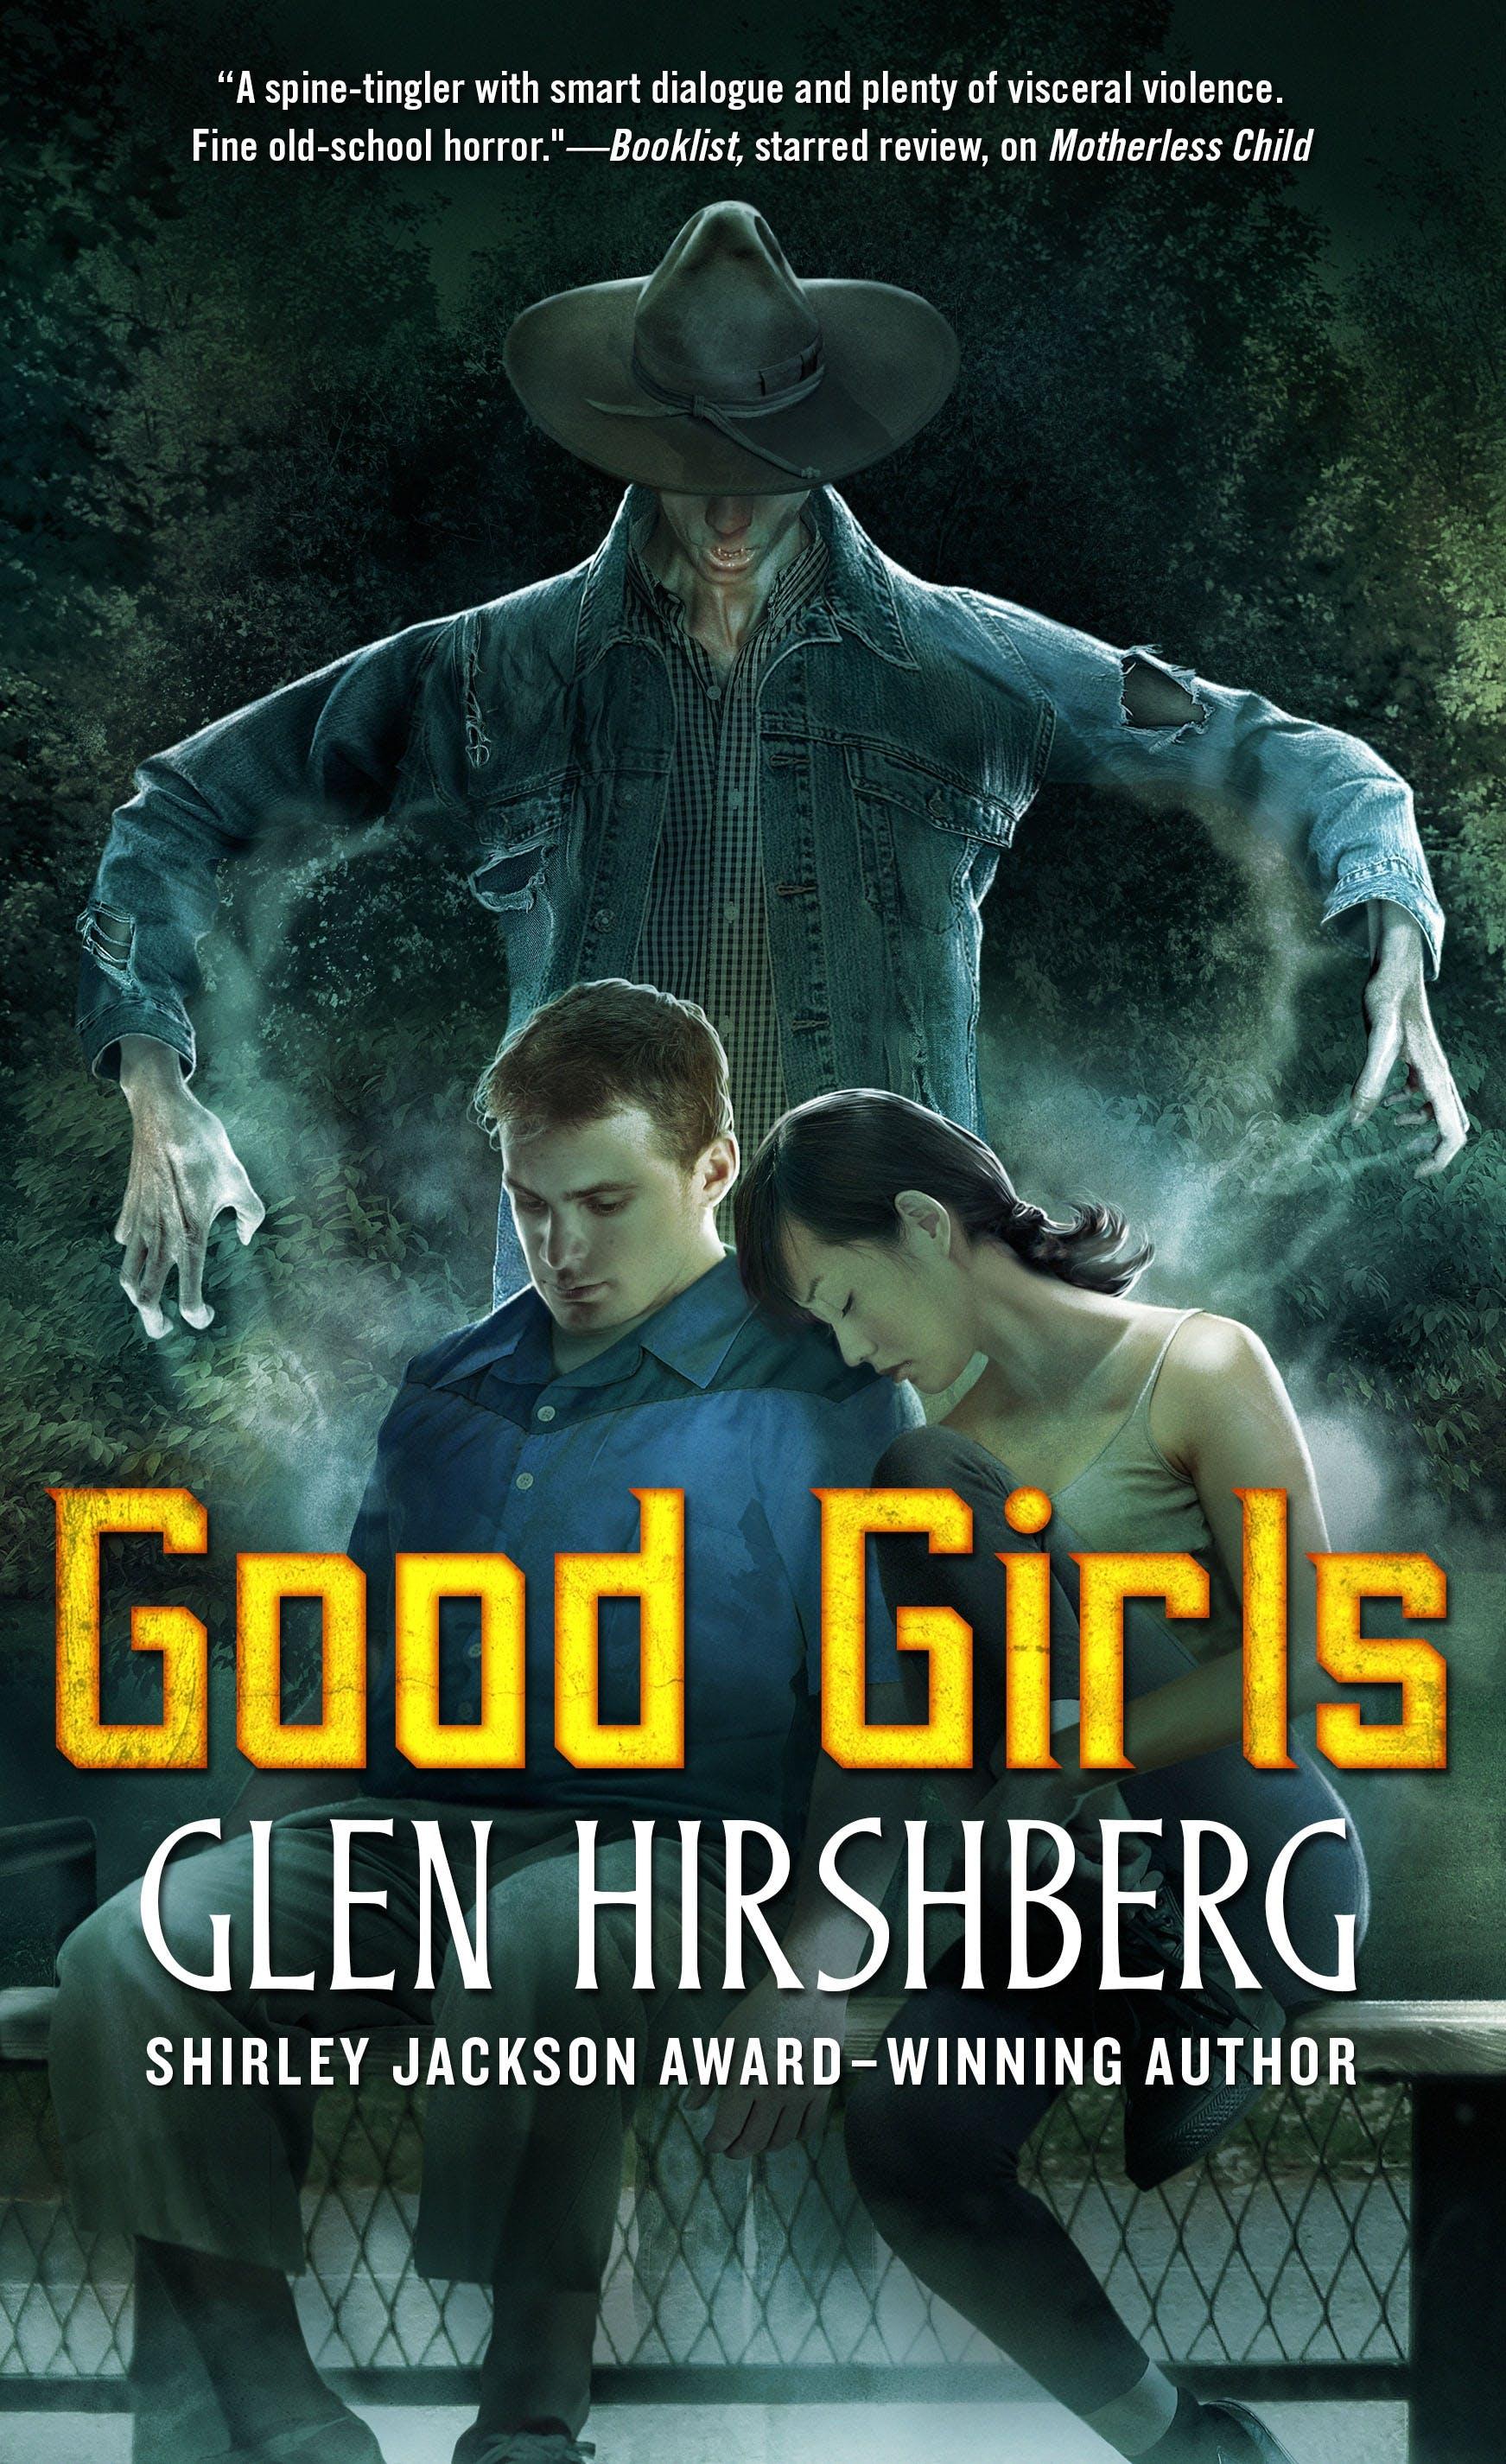 Image of Good Girls